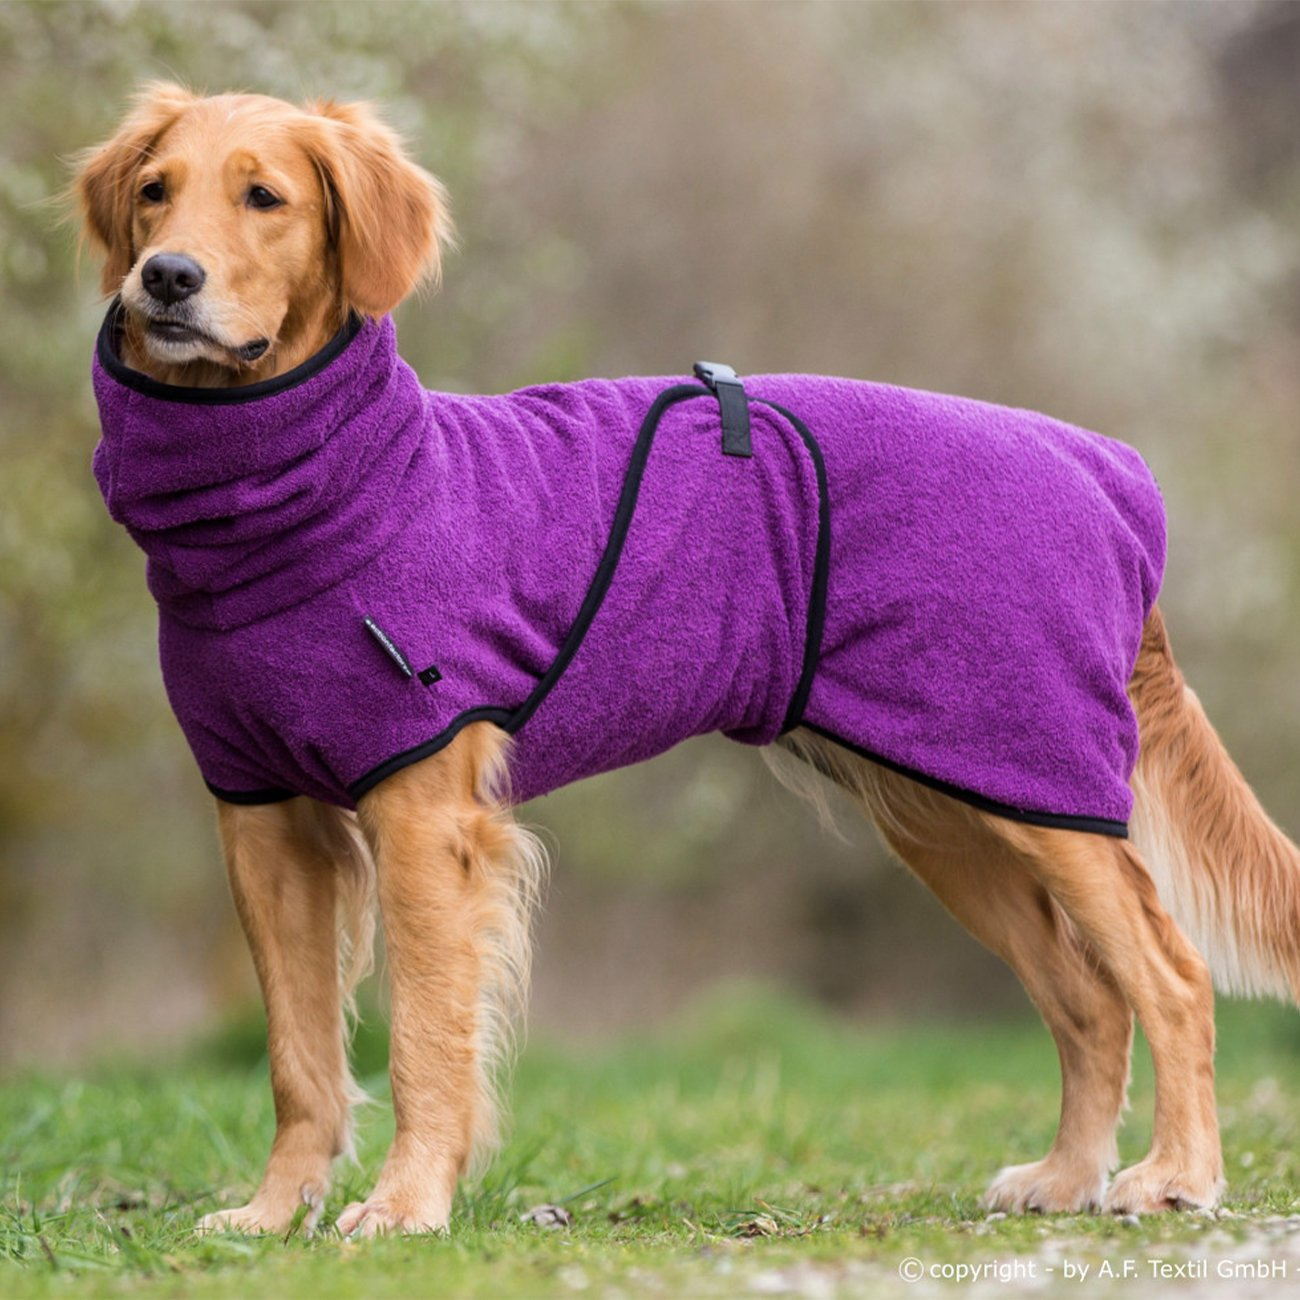 fit4dogs Trockenmantel Hund Dryup Cape, Bild 3